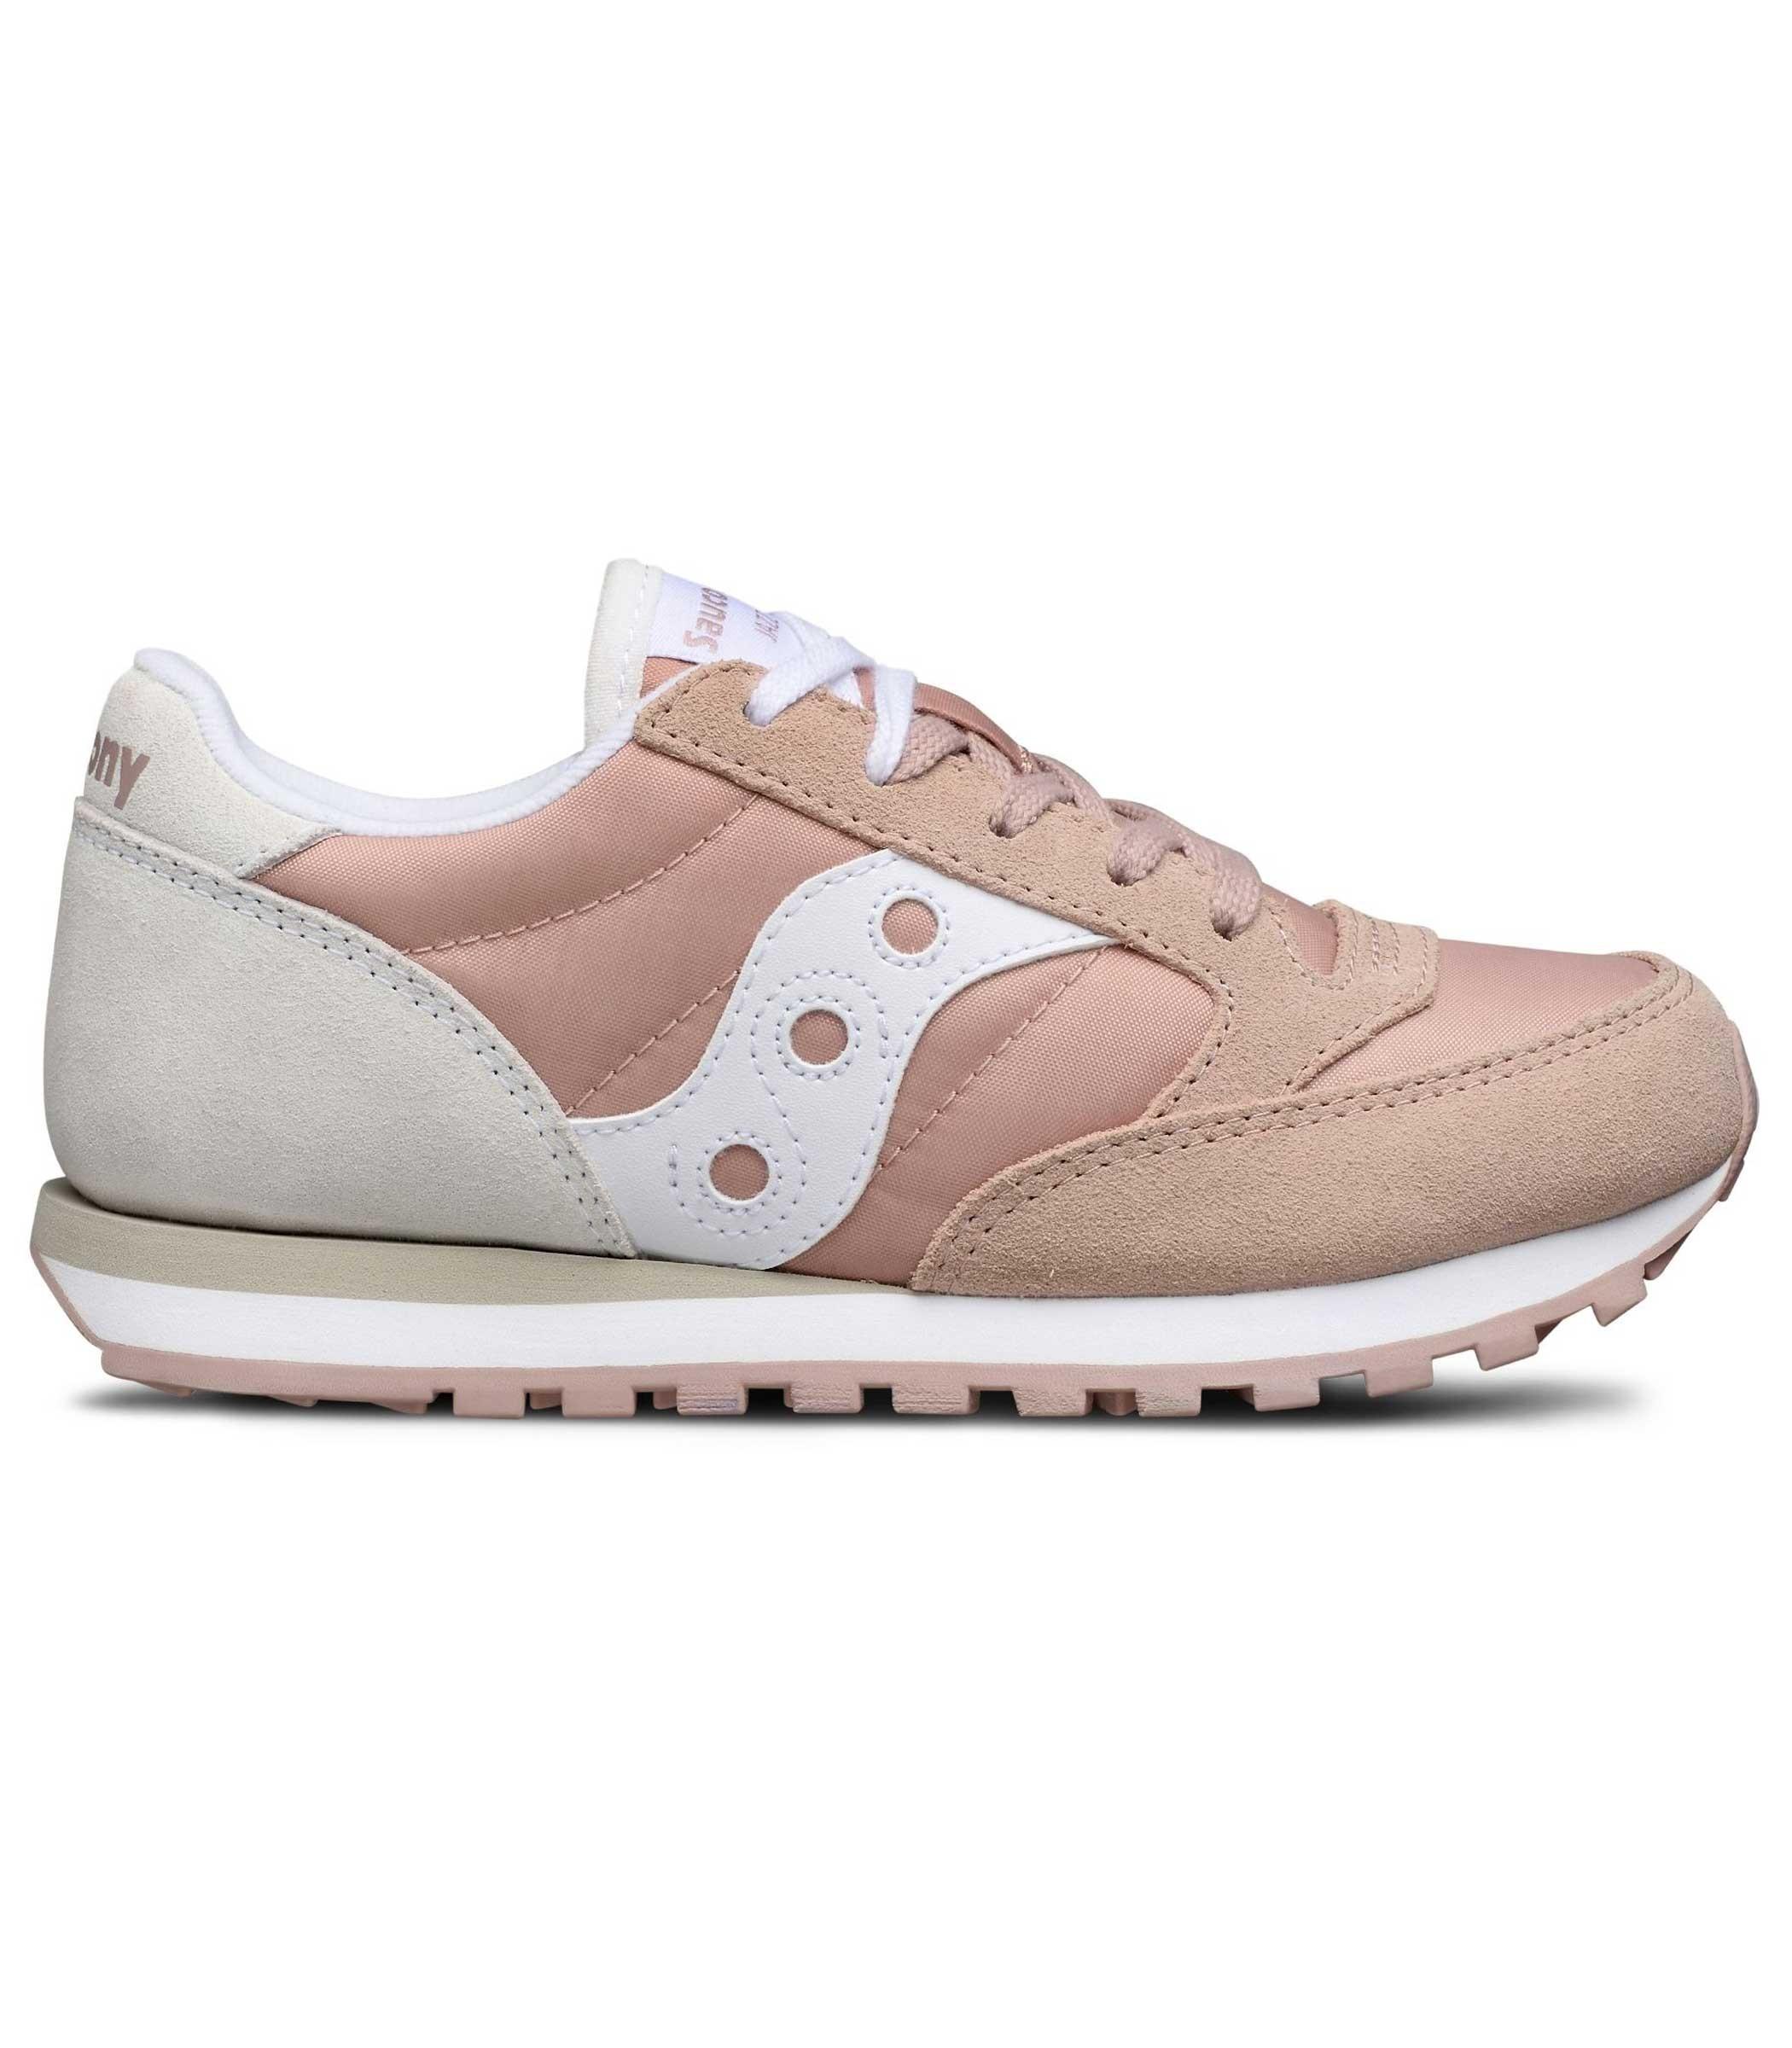 premium selection 213b6 6b658 Scarpe Sneakers Saucony JAZZ ORIGINAL PINK CREAM da bambina rif.